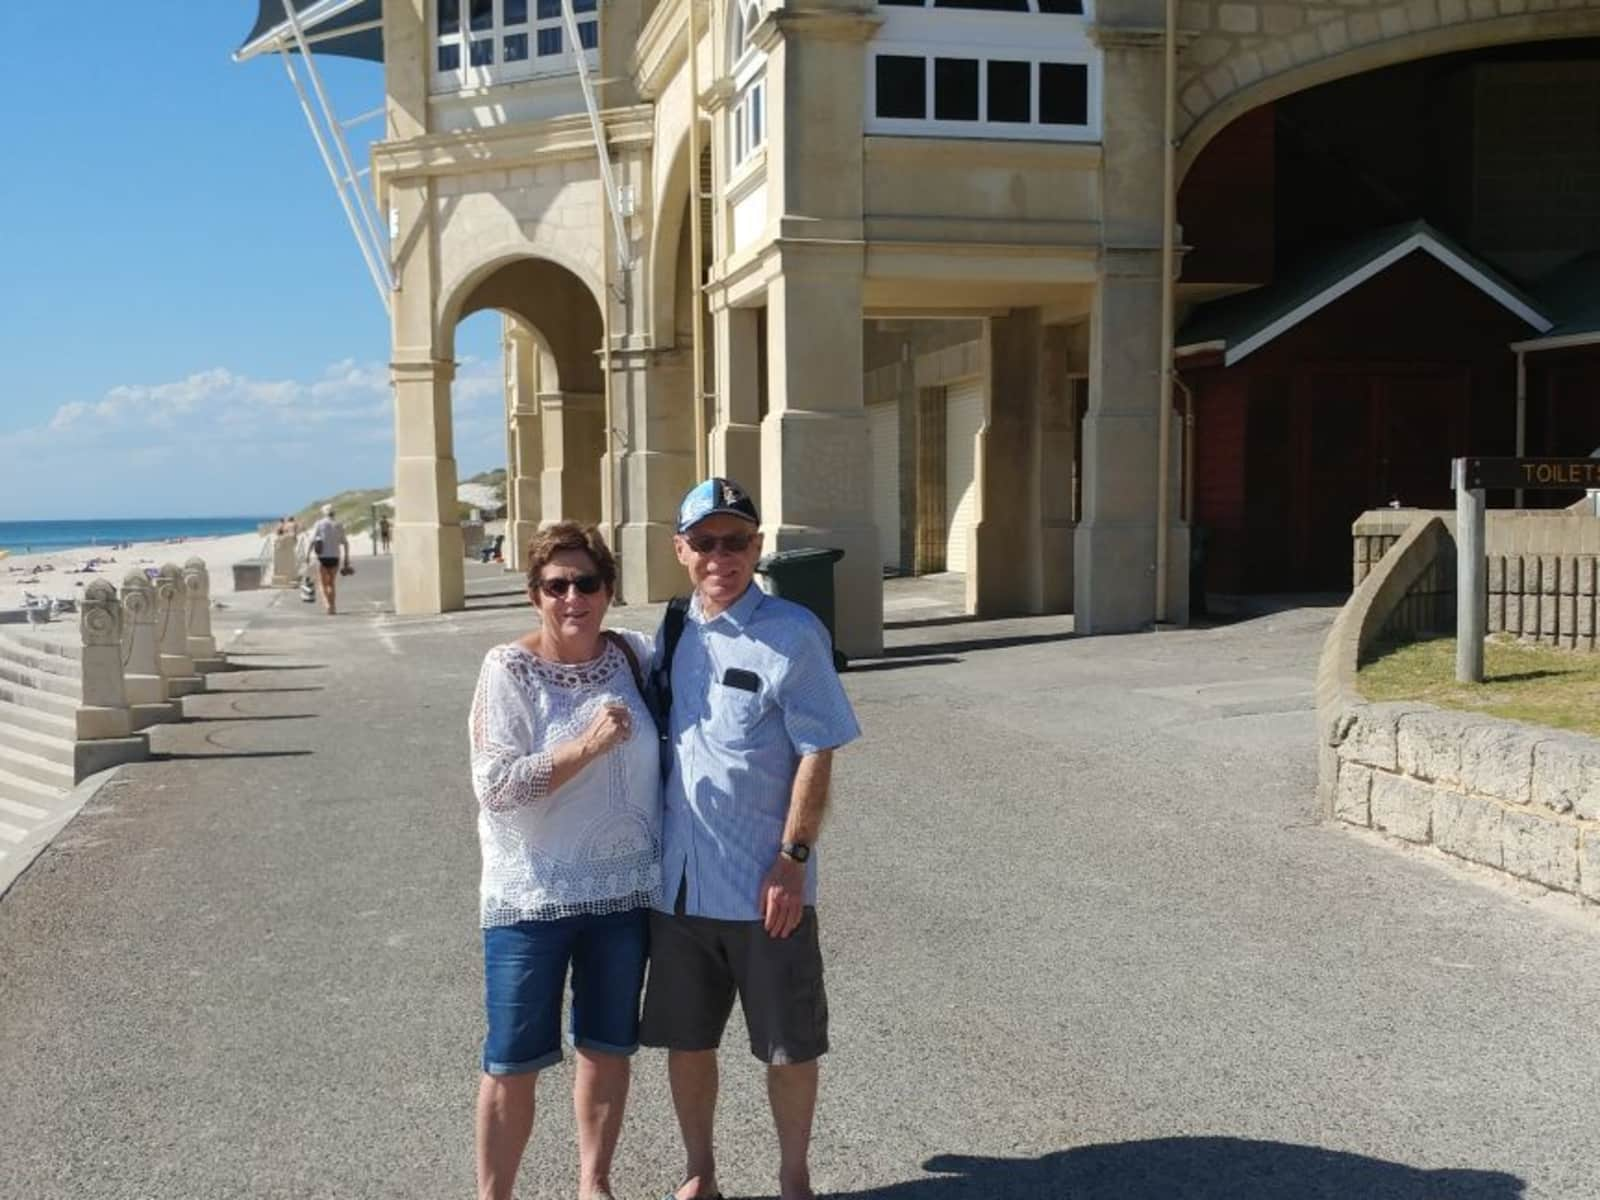 Marcia & Brian from Gisborne, New Zealand